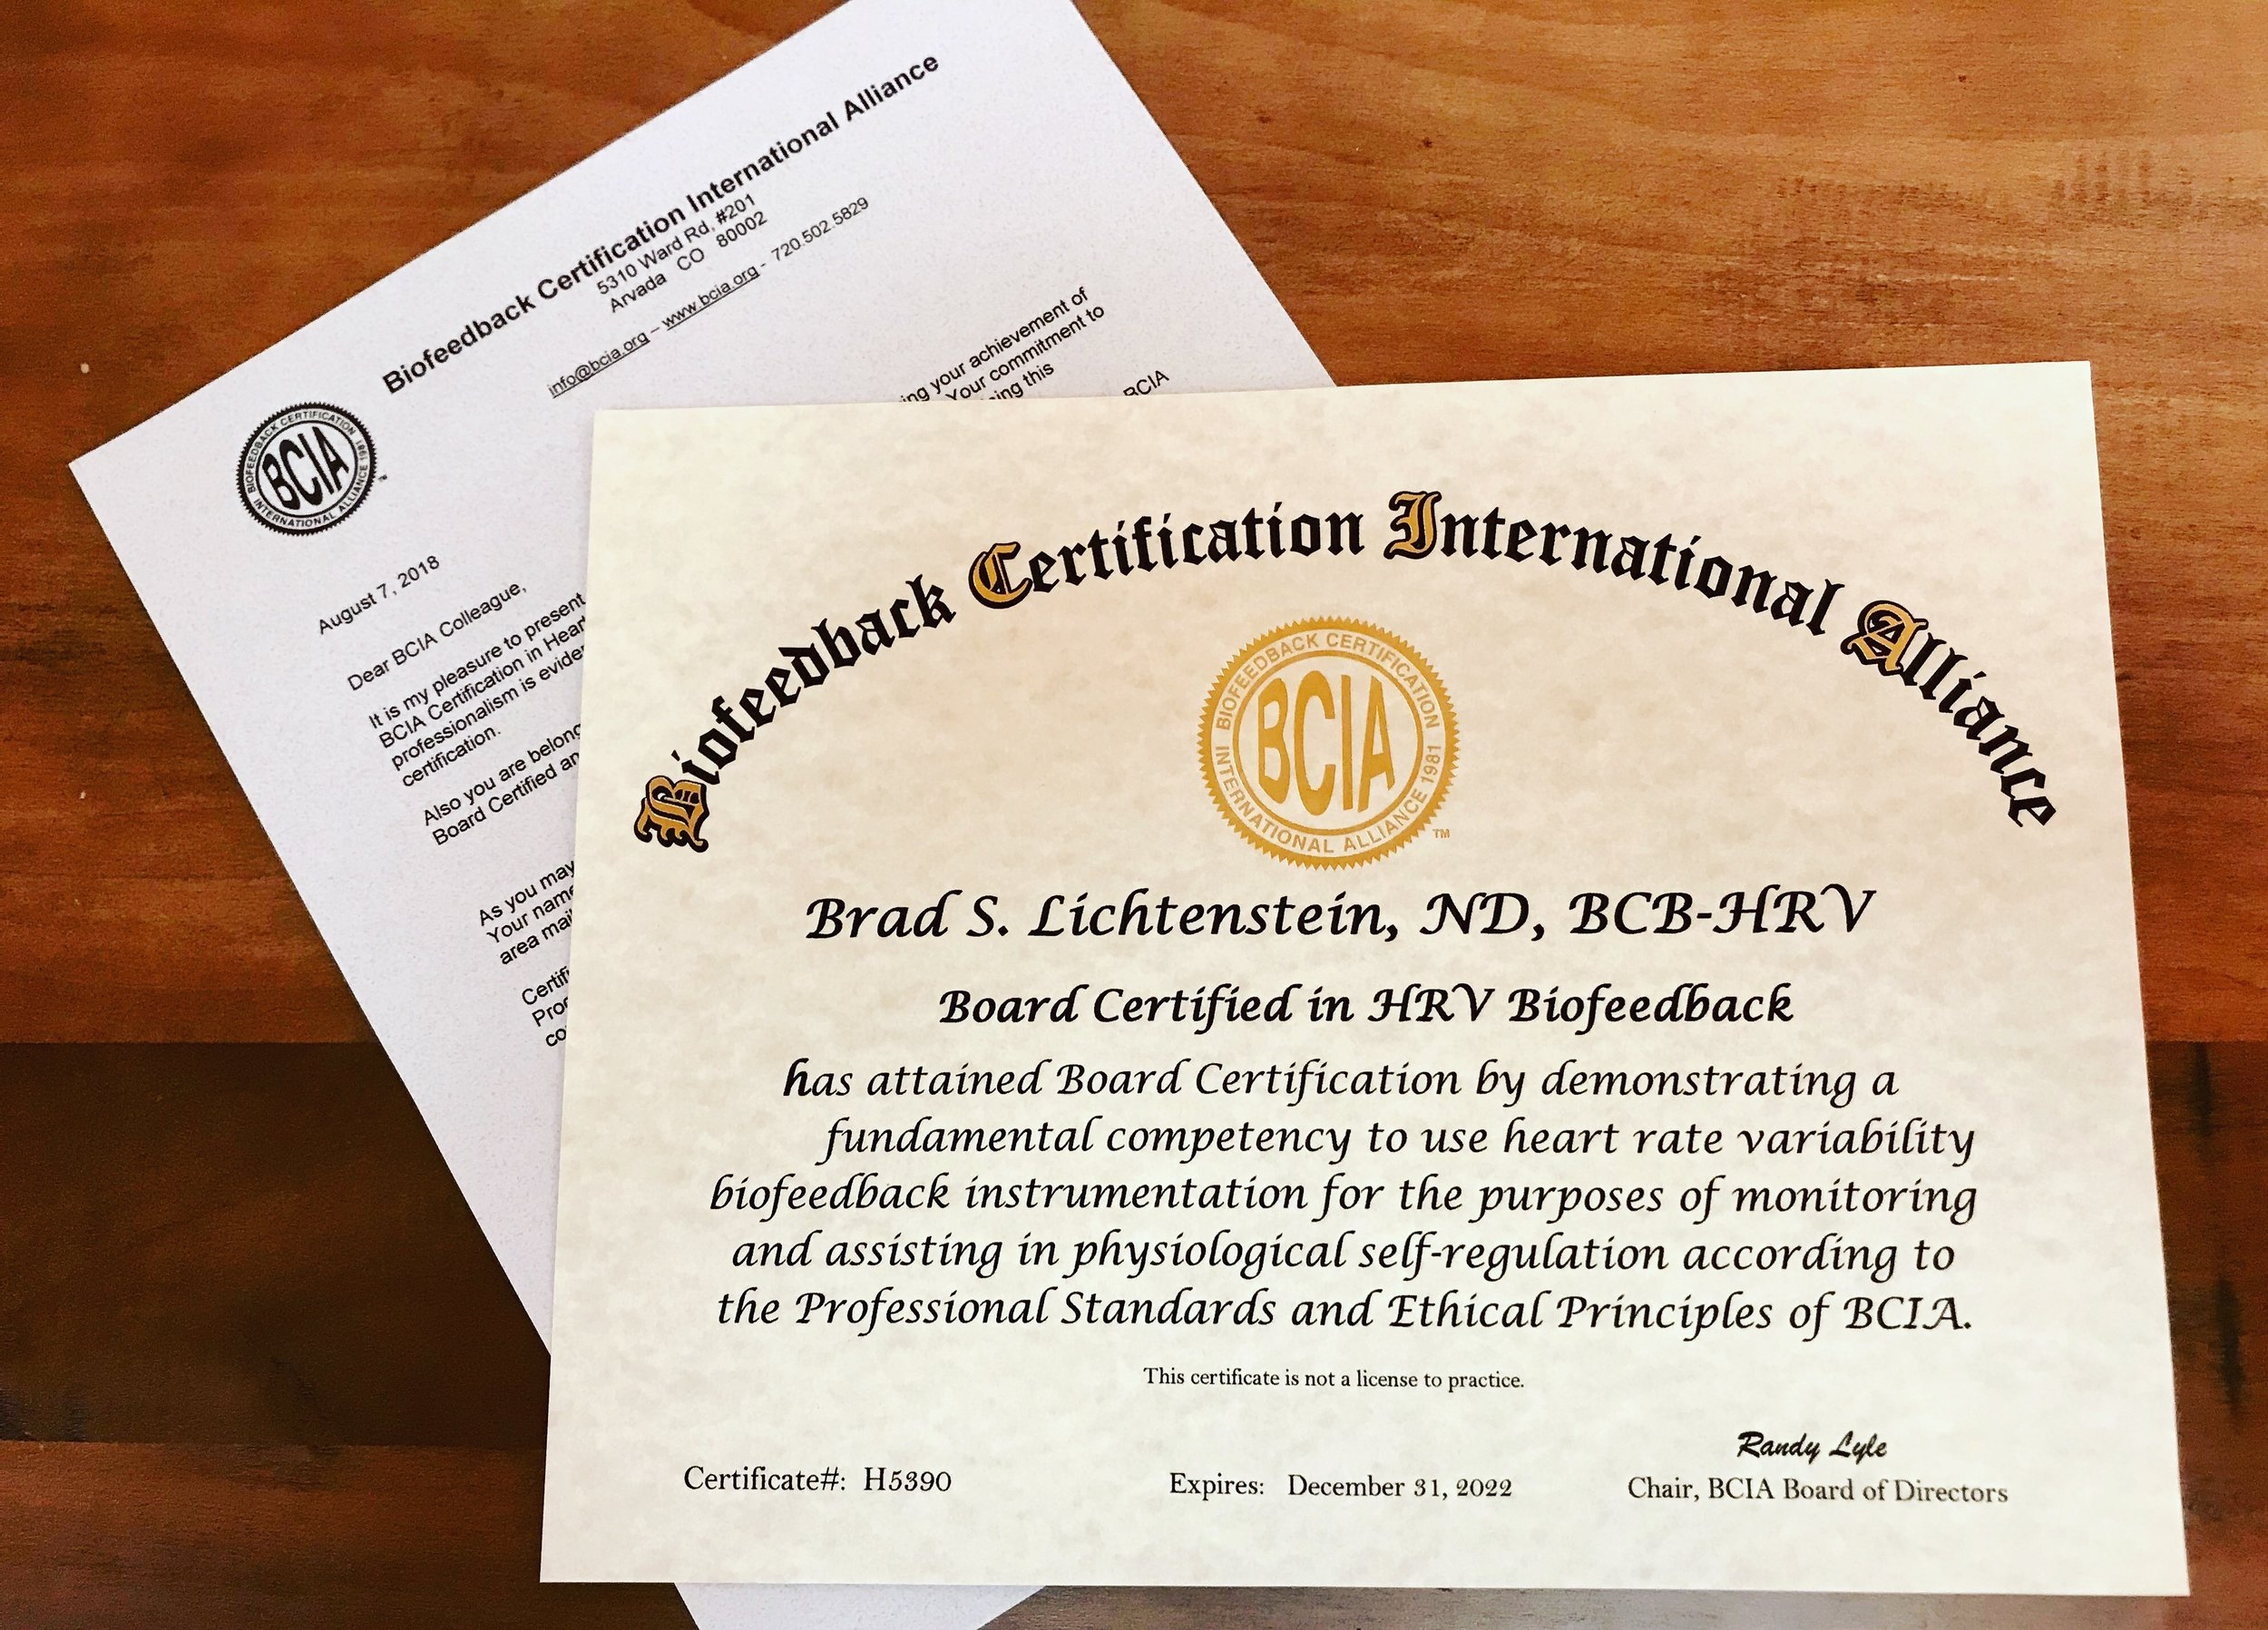 BCIA HRV Biofeedback Certification